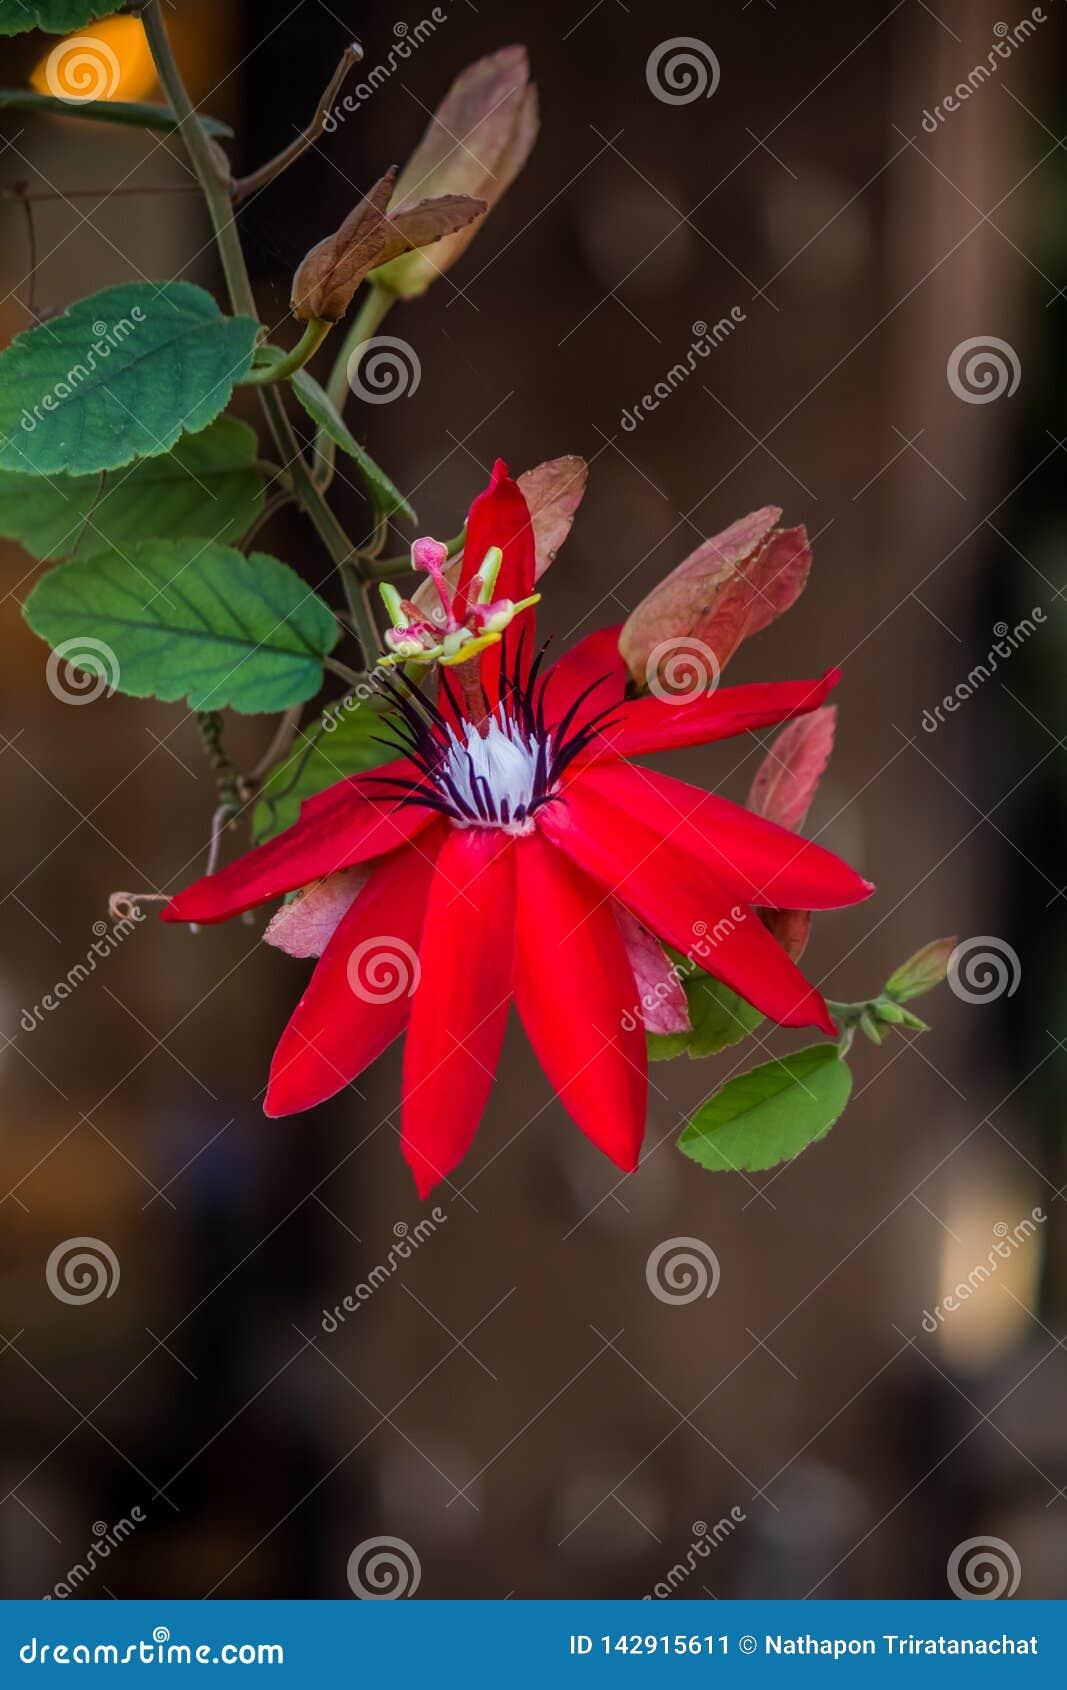 Beautiful Red Passion Flower Passiflora coccinea.